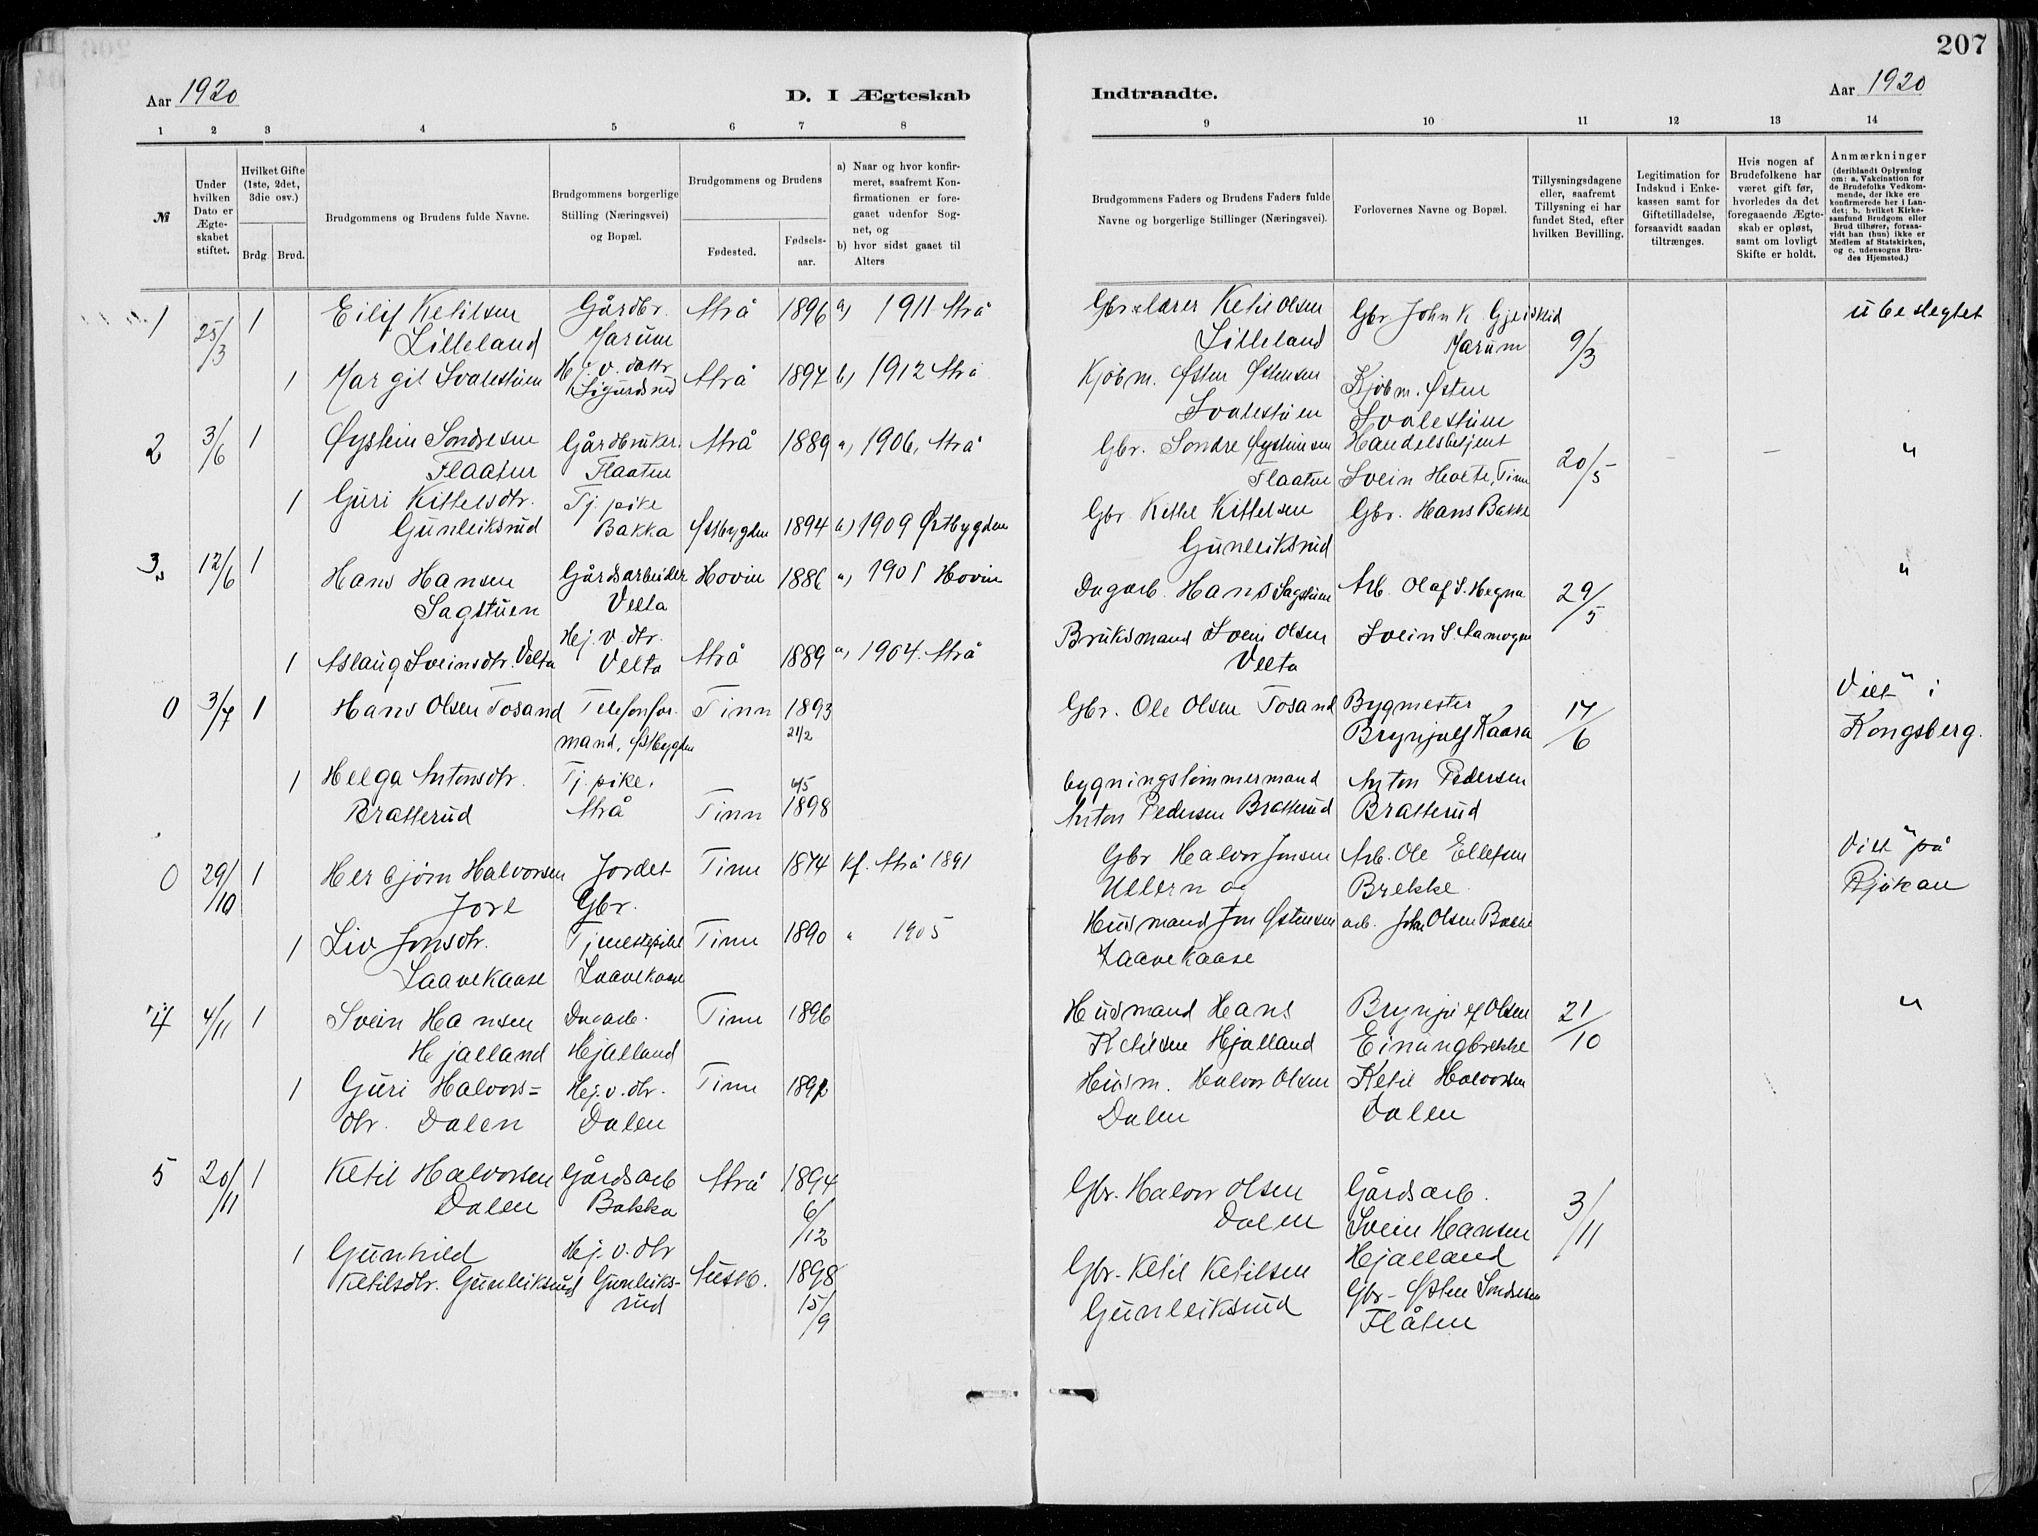 SAKO, Tinn kirkebøker, F/Fa/L0007: Ministerialbok nr. I 7, 1878-1922, s. 207